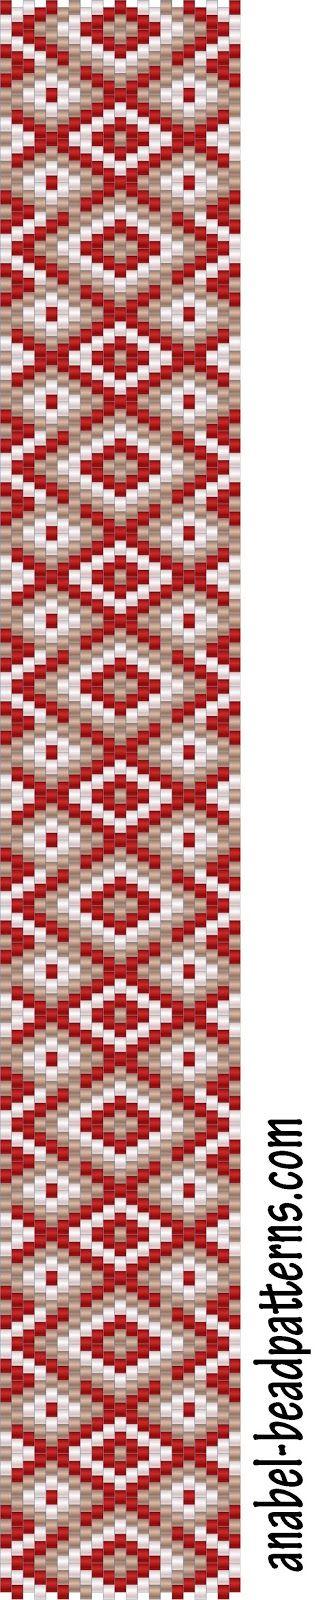 https://pl.pinterest.com/vchandler567/peyote-patterns/ хема браслета Забытые узоры - Free peyote bracelet pattern